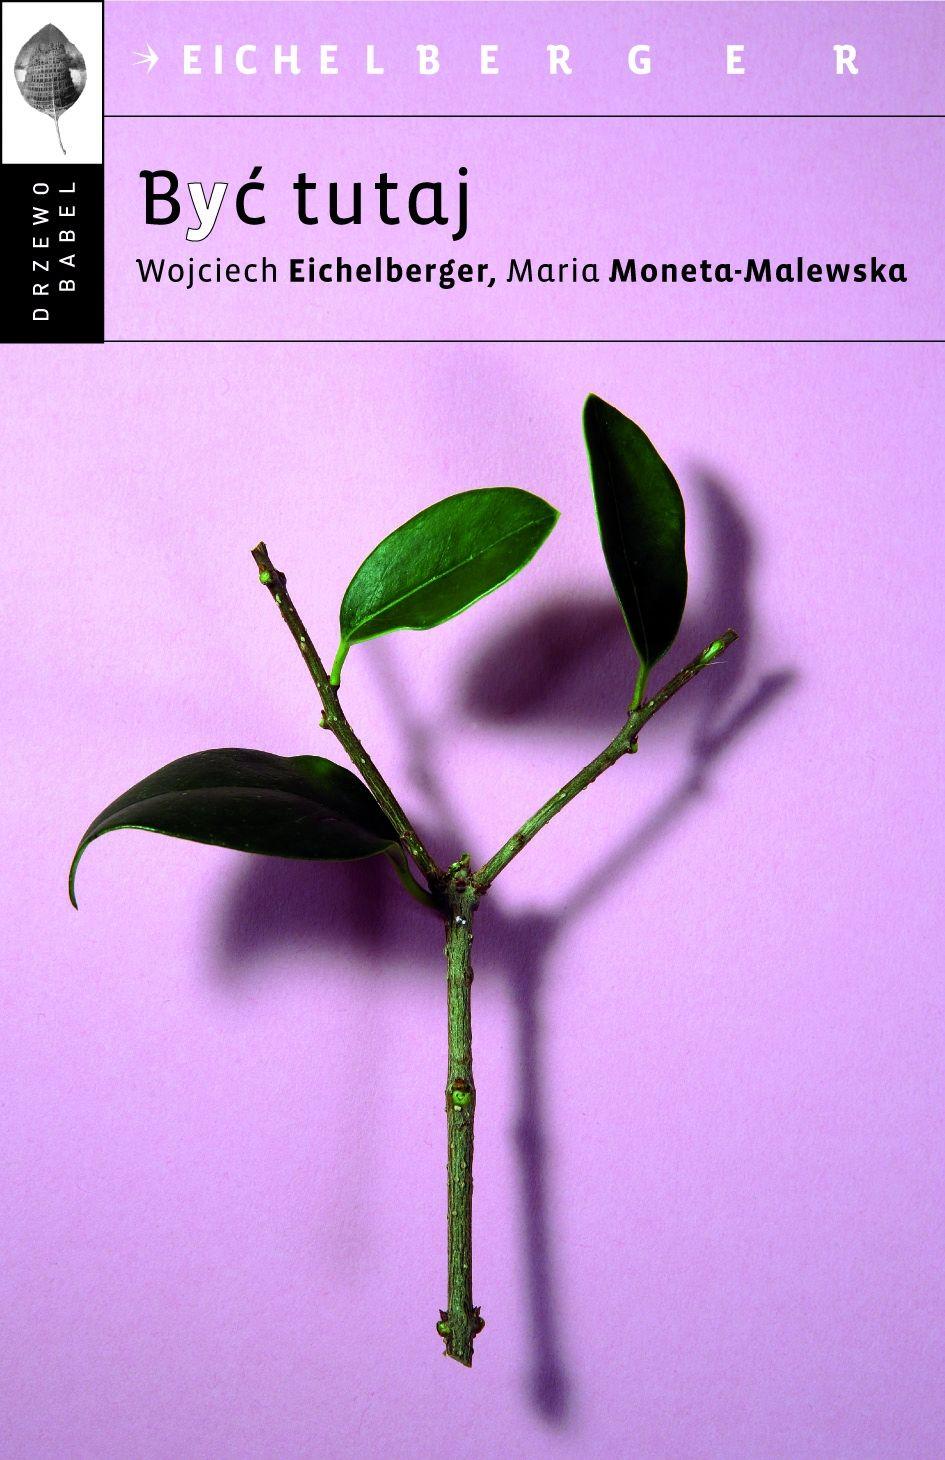 Być tutaj - Maria Moneta-Malewska, Wojciech Eichelberger